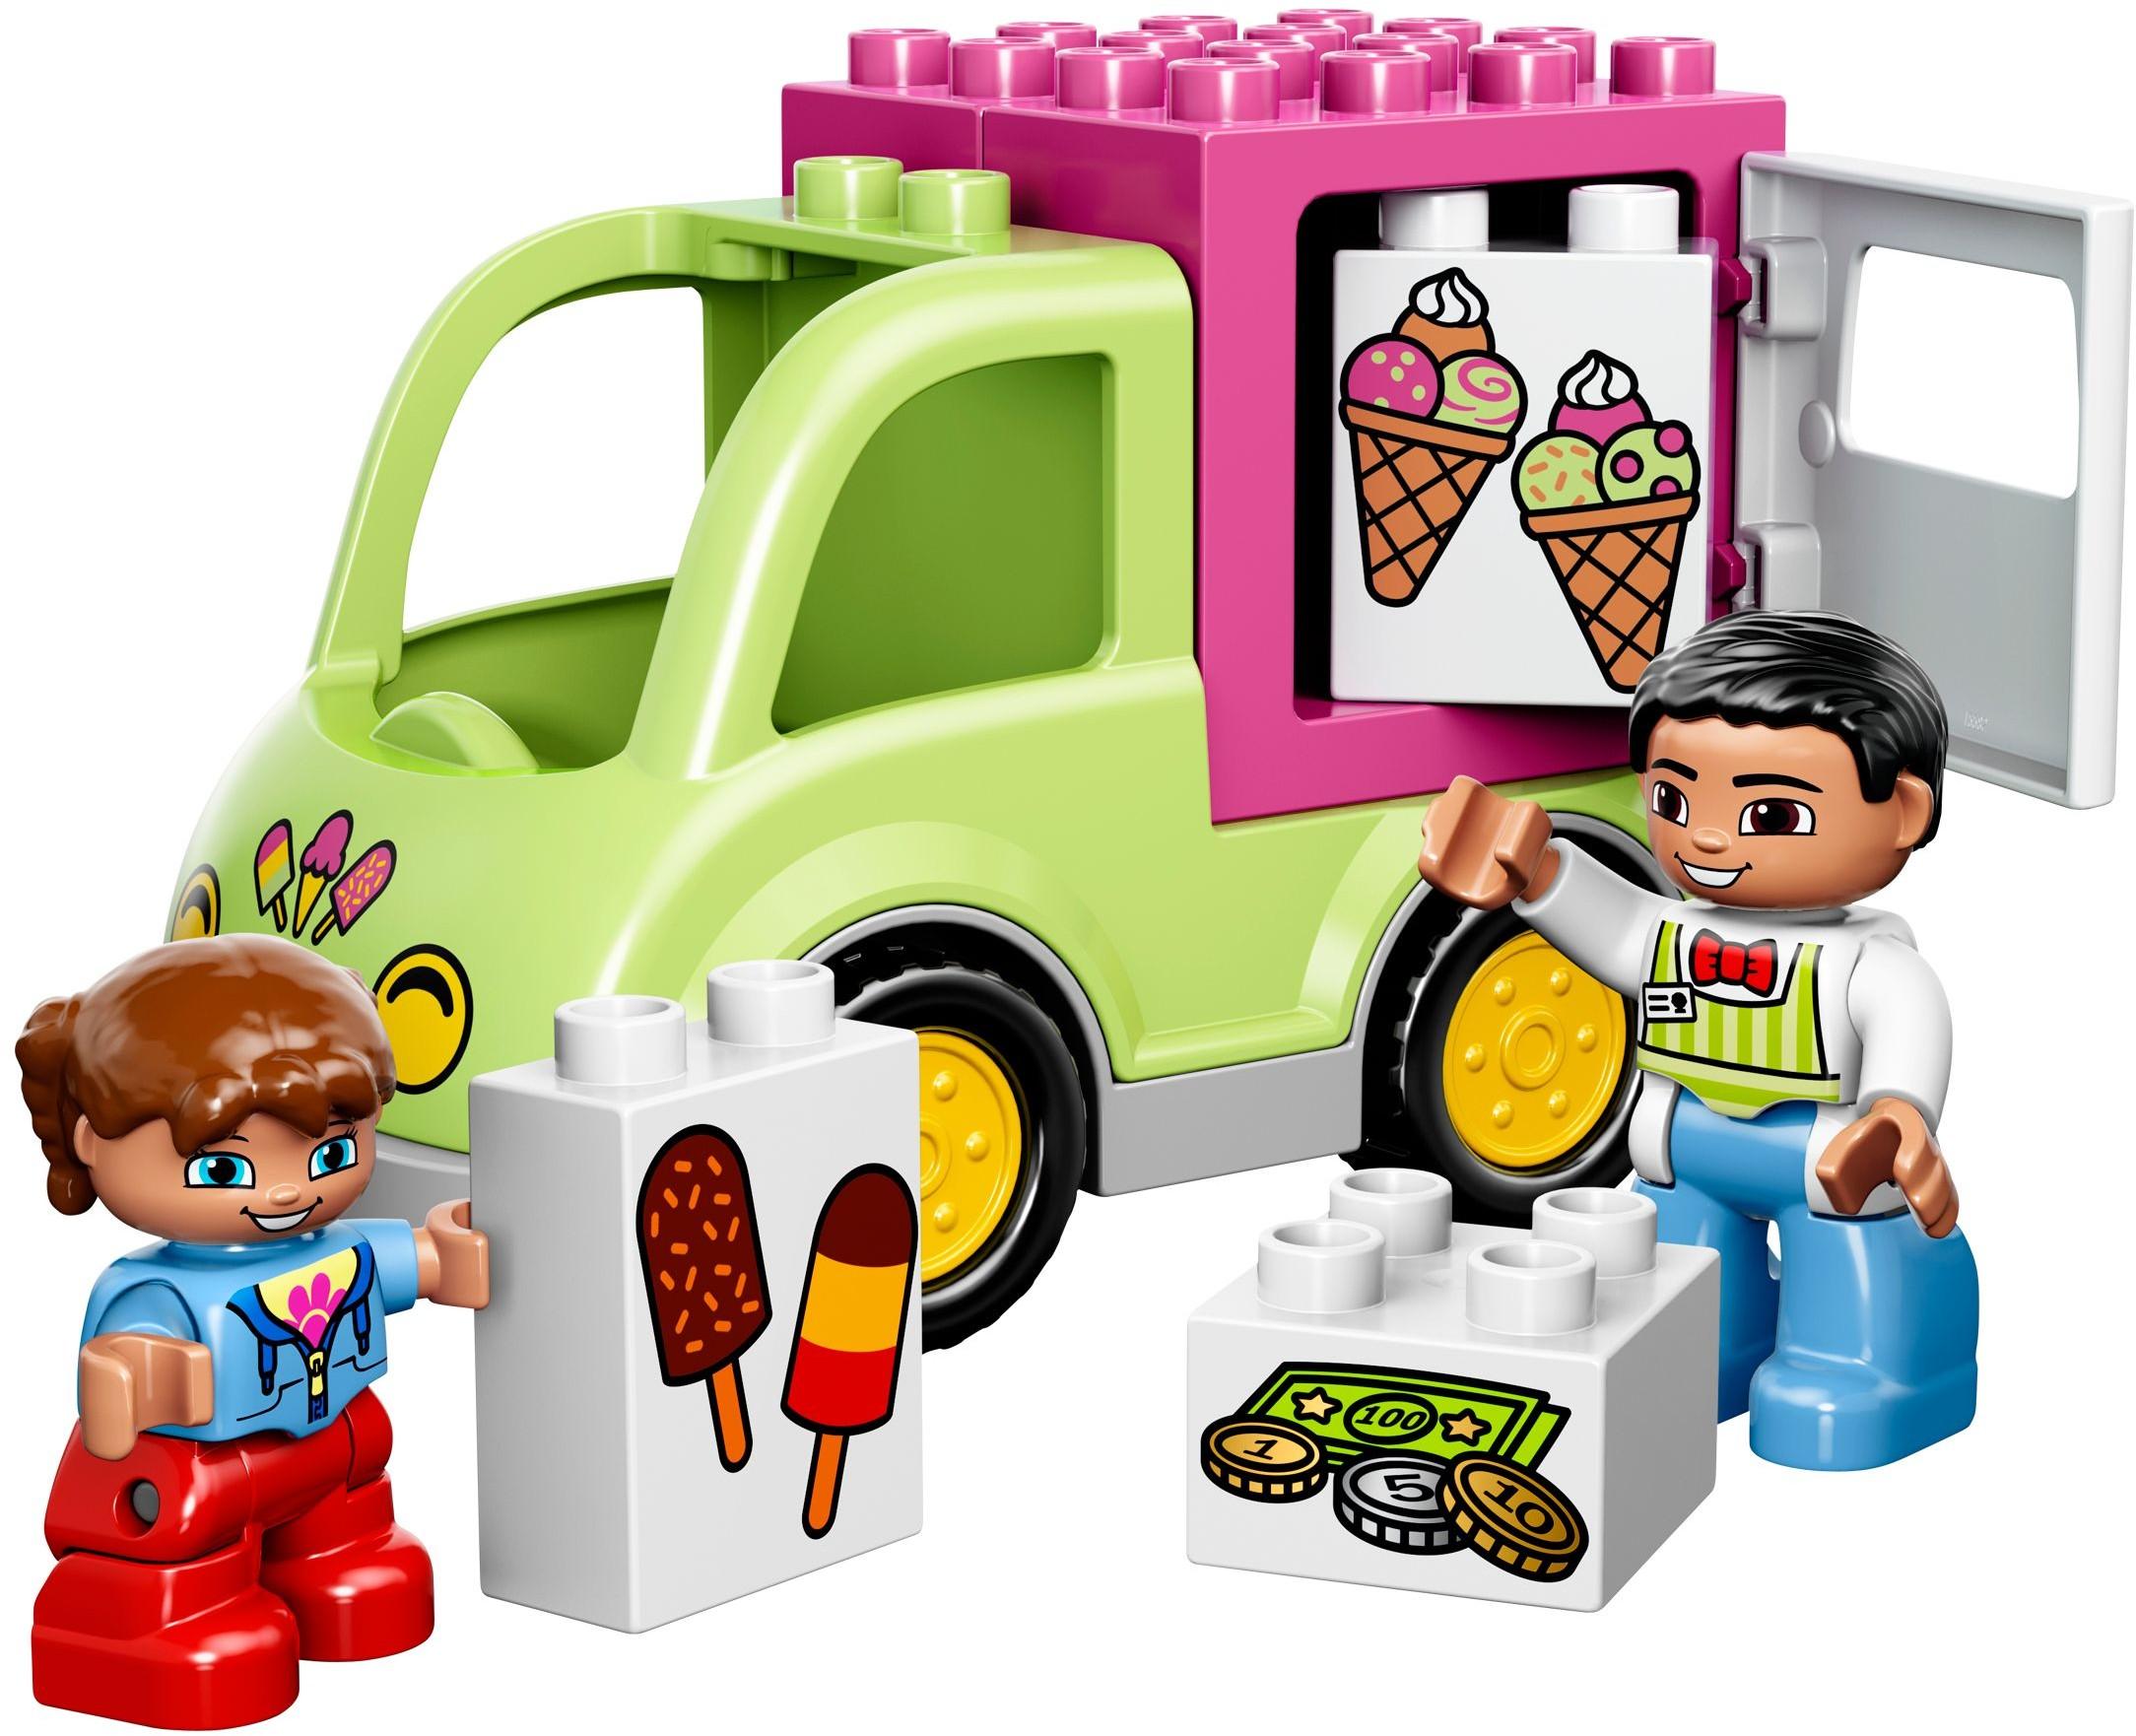 2015 Duplo Brickset Lego Set Guide And Database 10593 Fire Station Ice Cream Truck